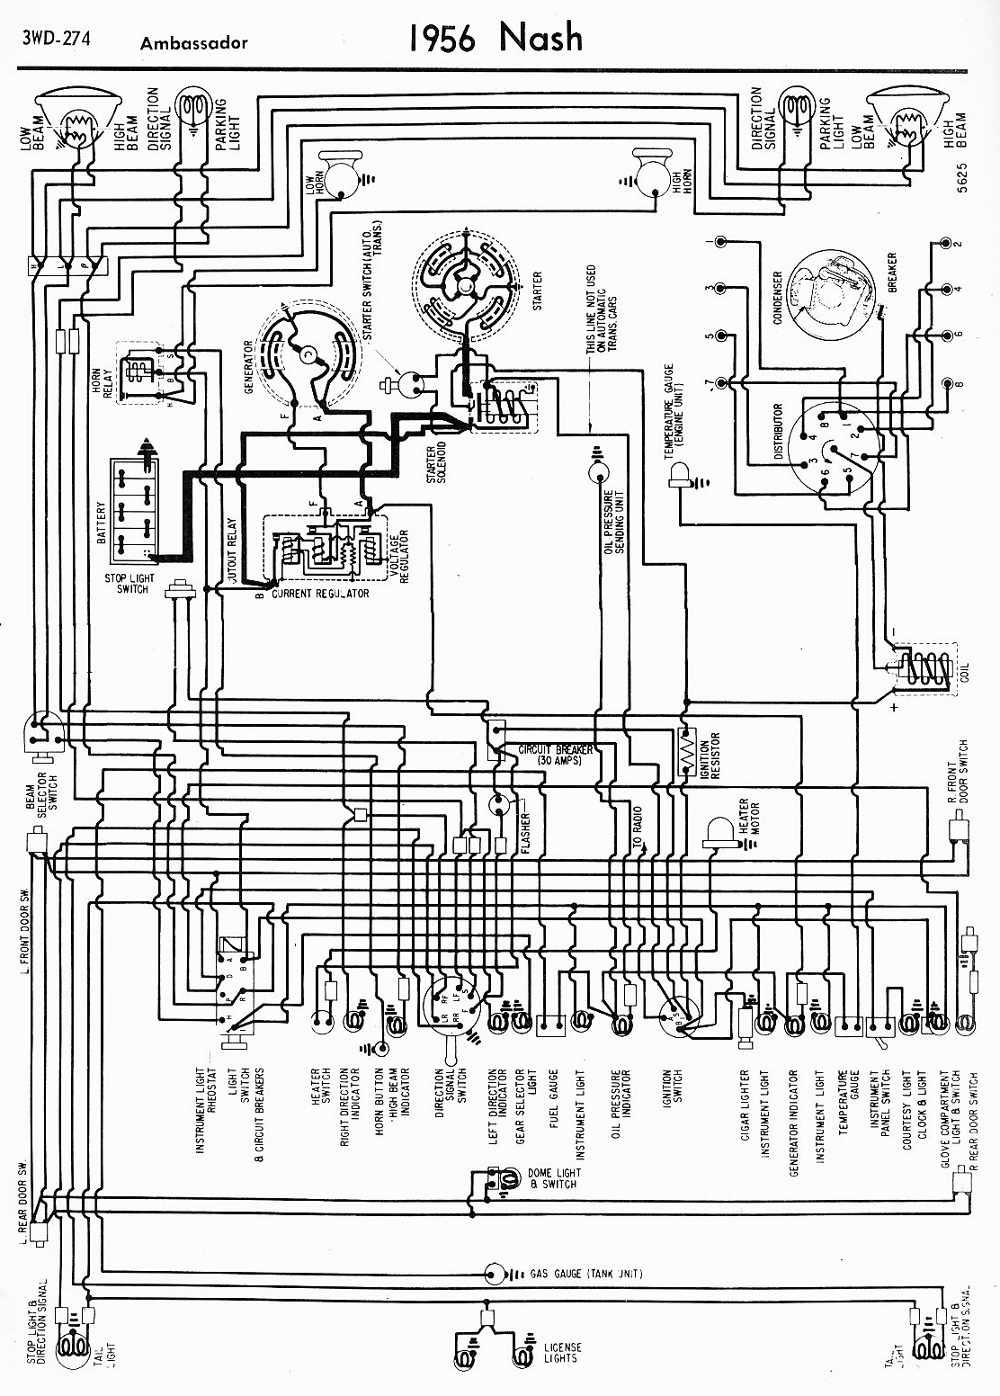 Mg Tf 1500 Wiring Diagram Schematics Data 1983 Volvo 240 Ilration And Luxury